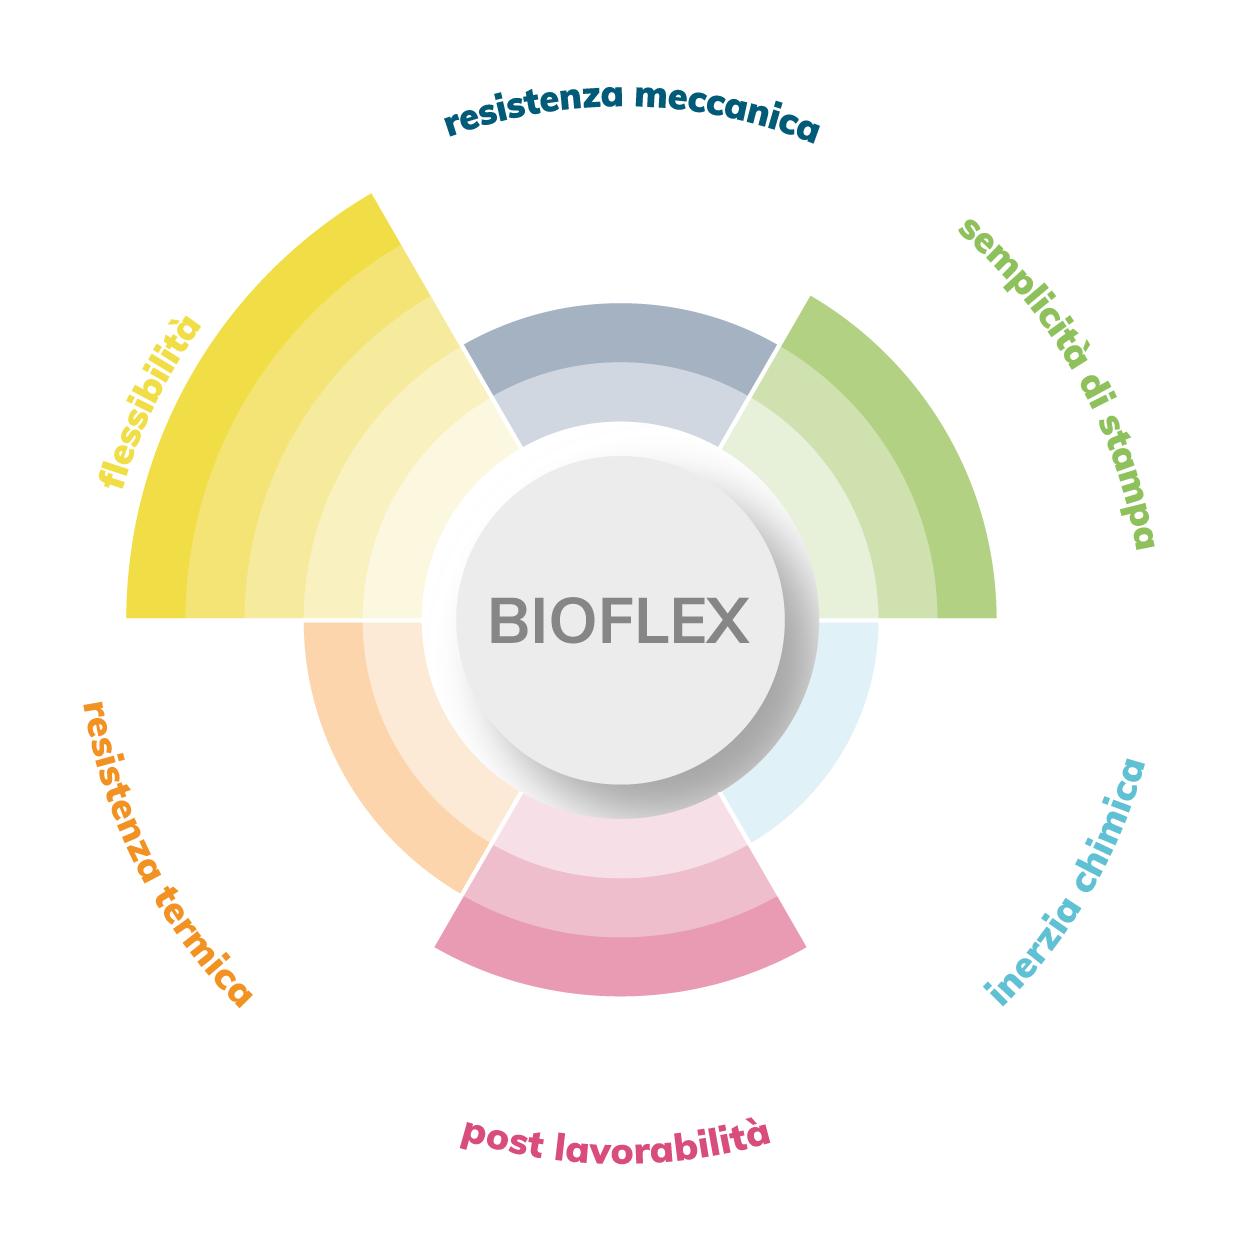 FiloAlfa 1,75 mm PLA Bioflex filamento medicale flessibile, Bianco